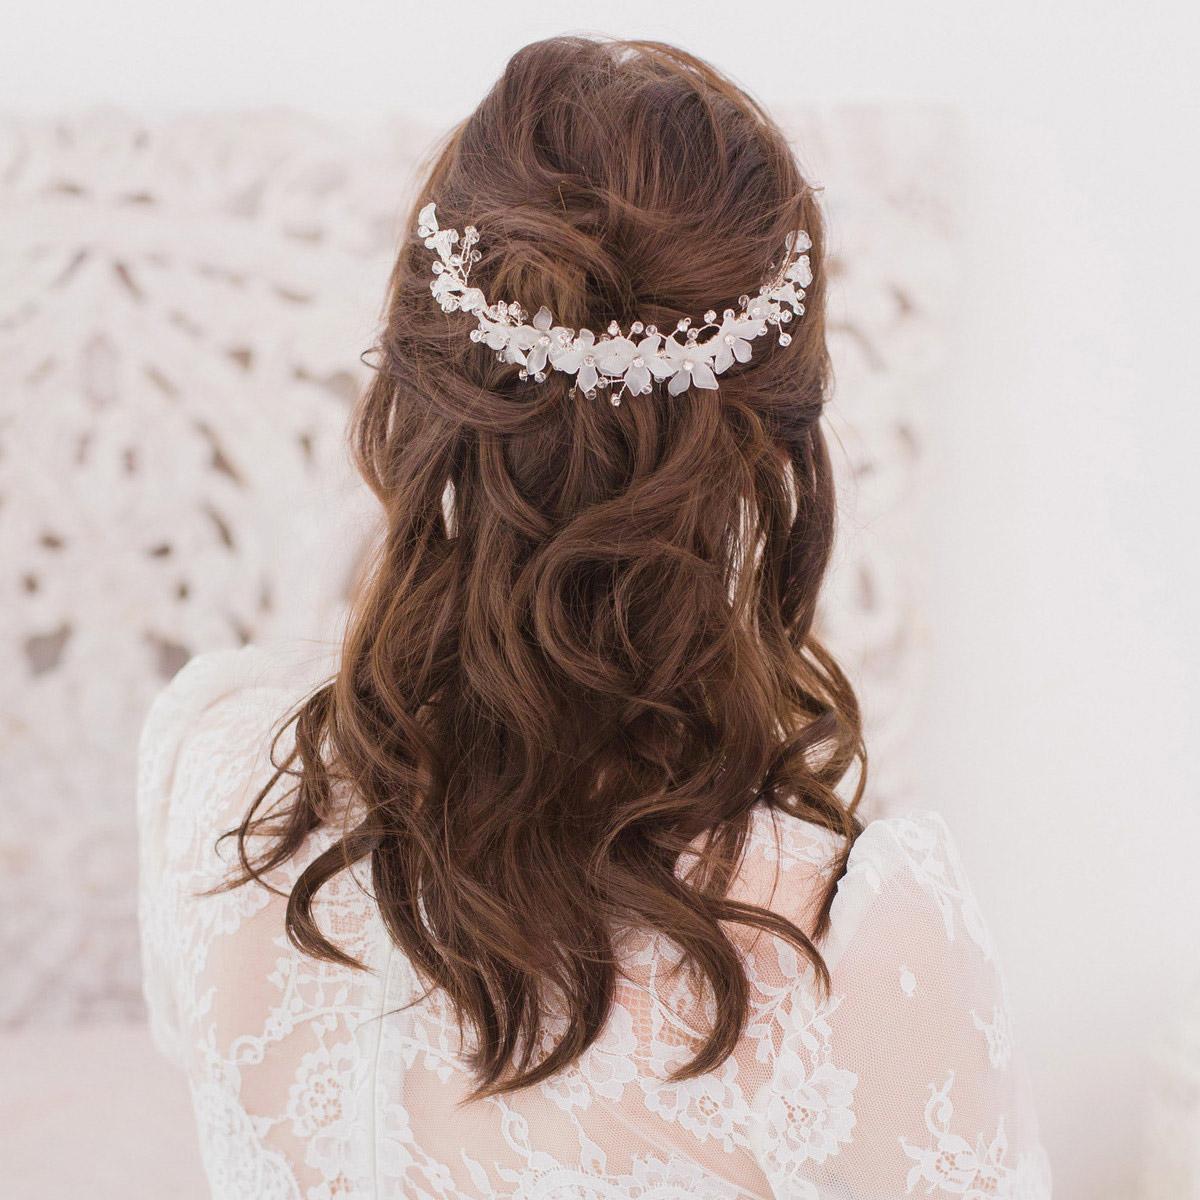 ultimate guide to wedding veils - rock my wedding